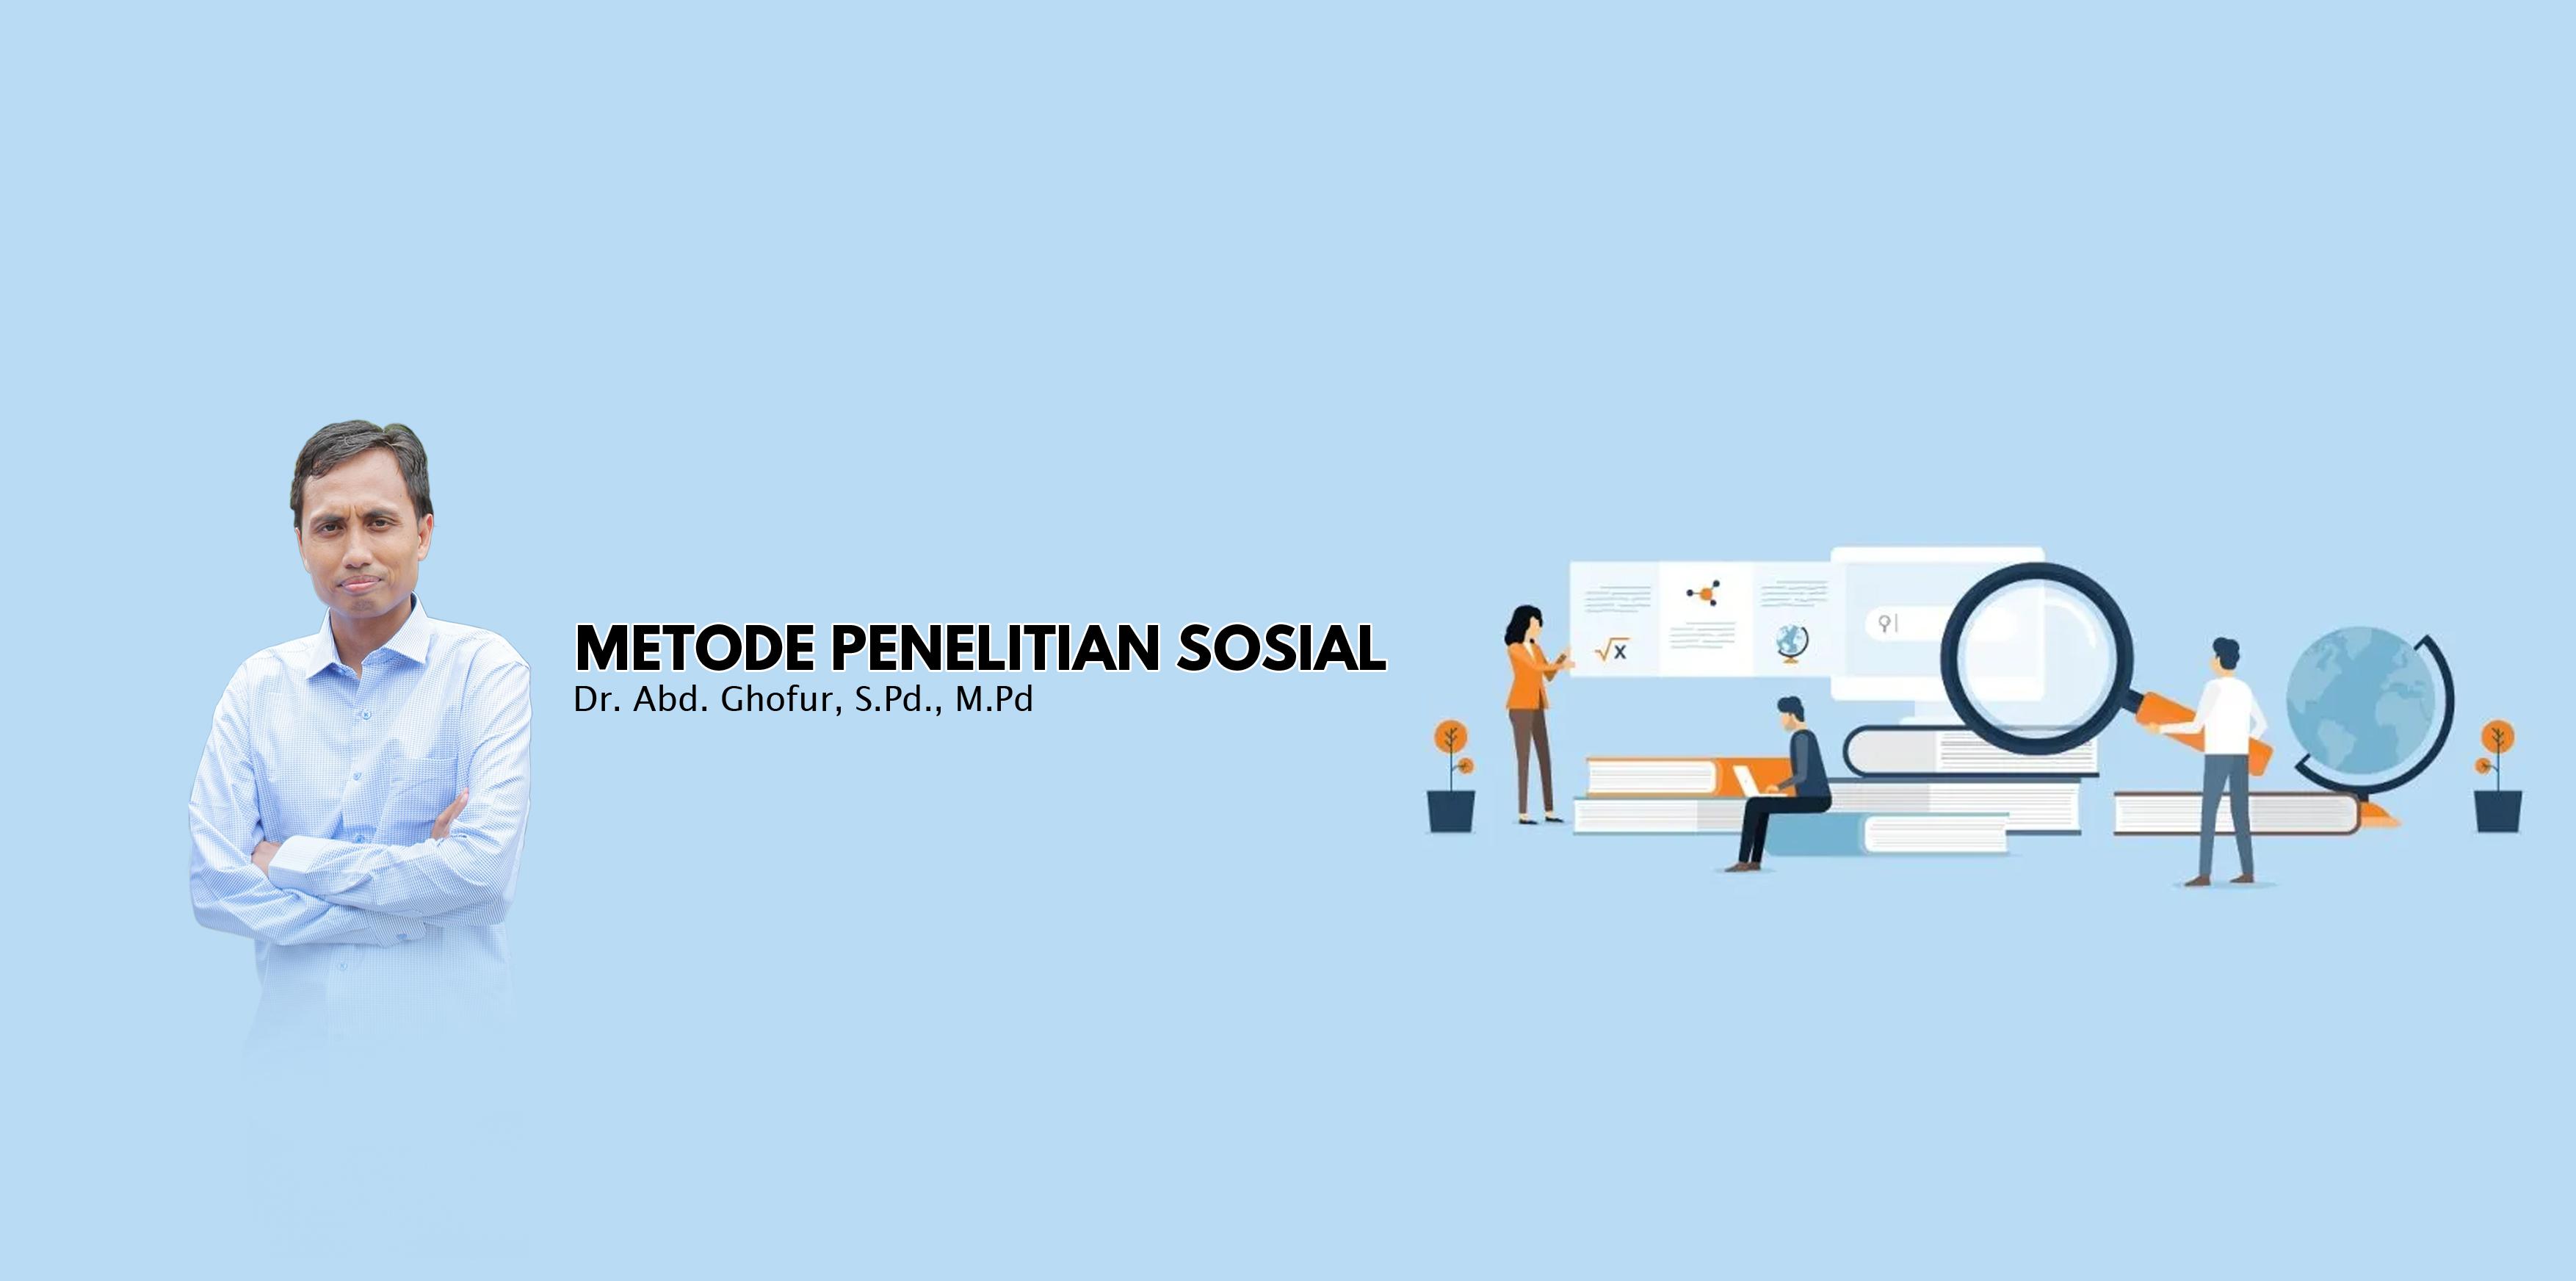 2019 - A - METODE PENELITIAN SOSIAL